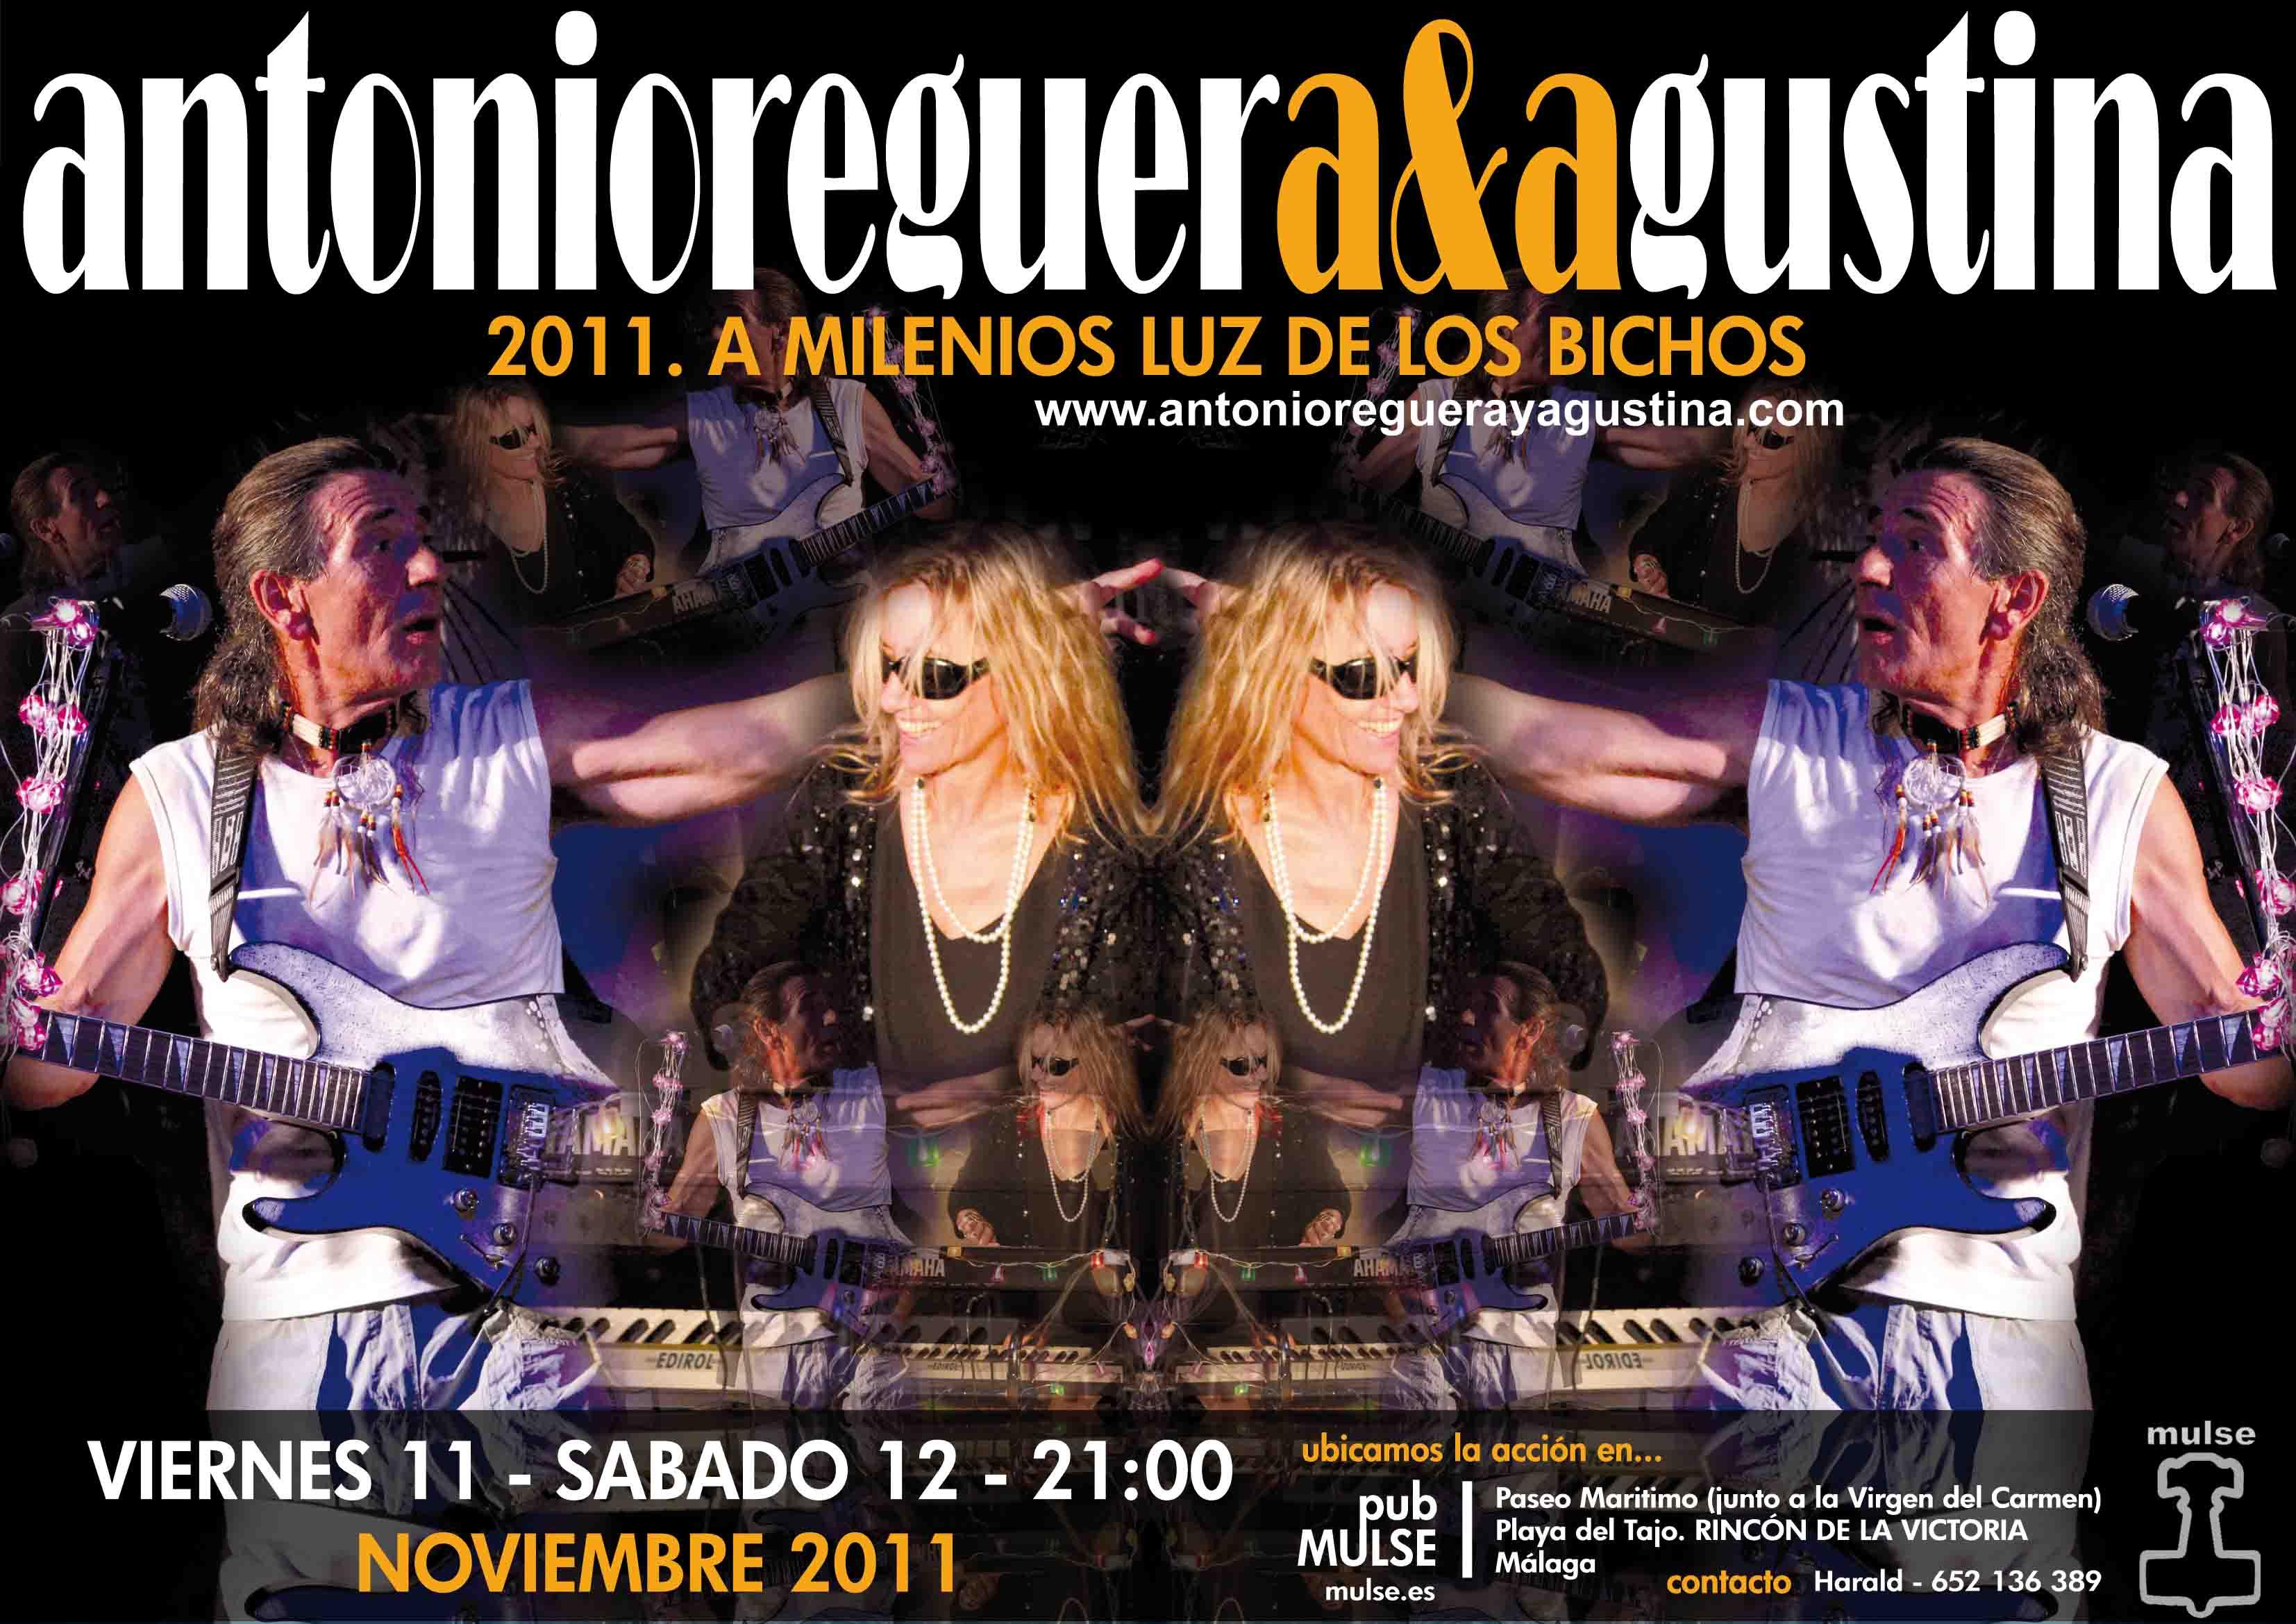 blog MULSE RincondelaVictoria V11yS12_Noviembre_11.jpg